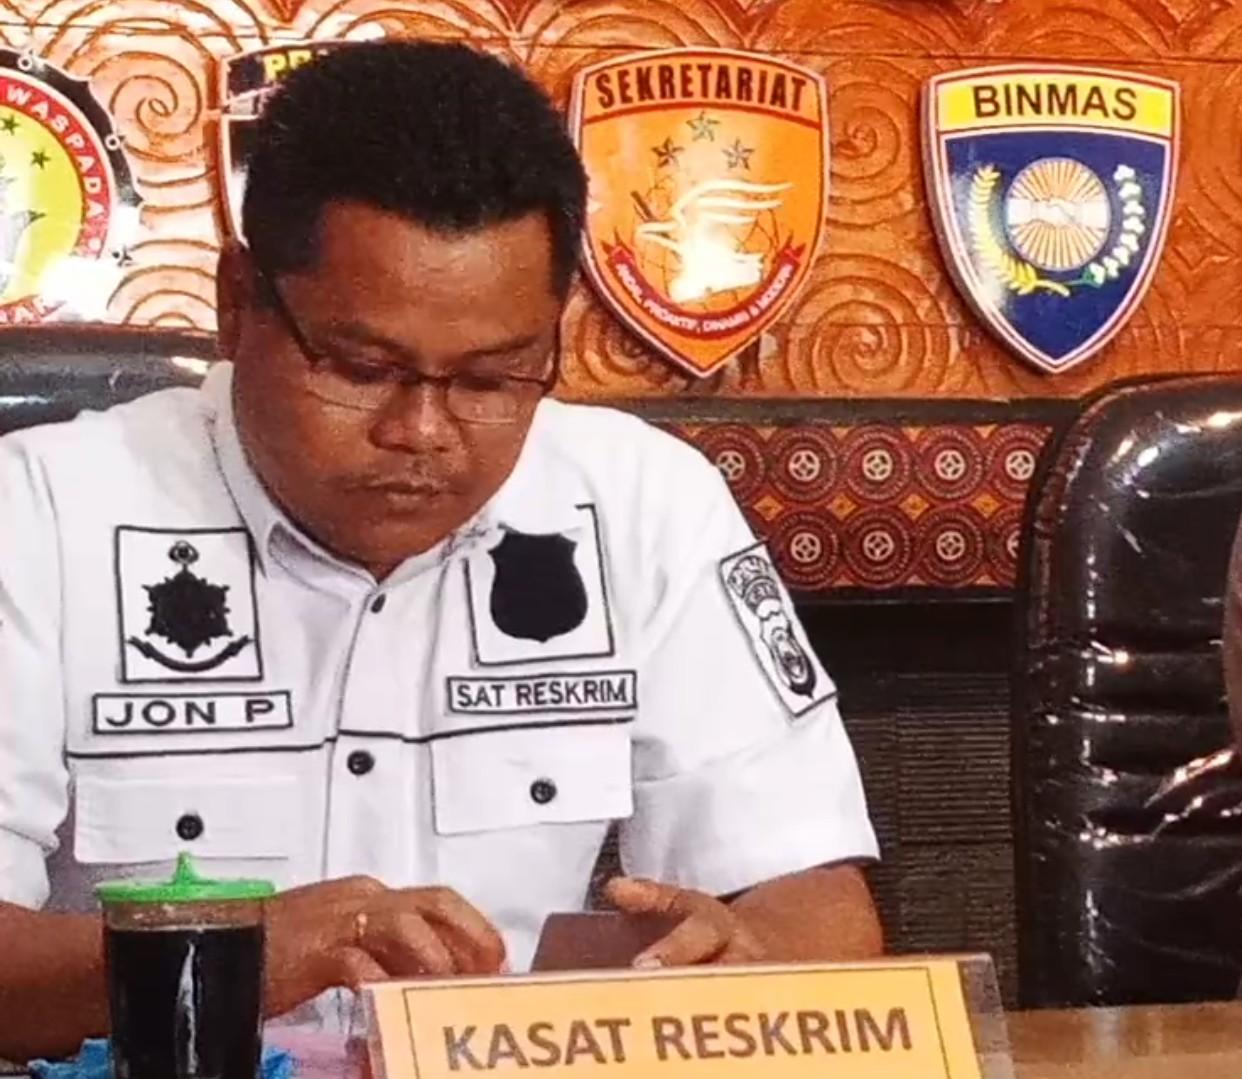 Januari Hingga Juni 2019, Polres Tana Toraja Tangani 21 Kasus Percabulan